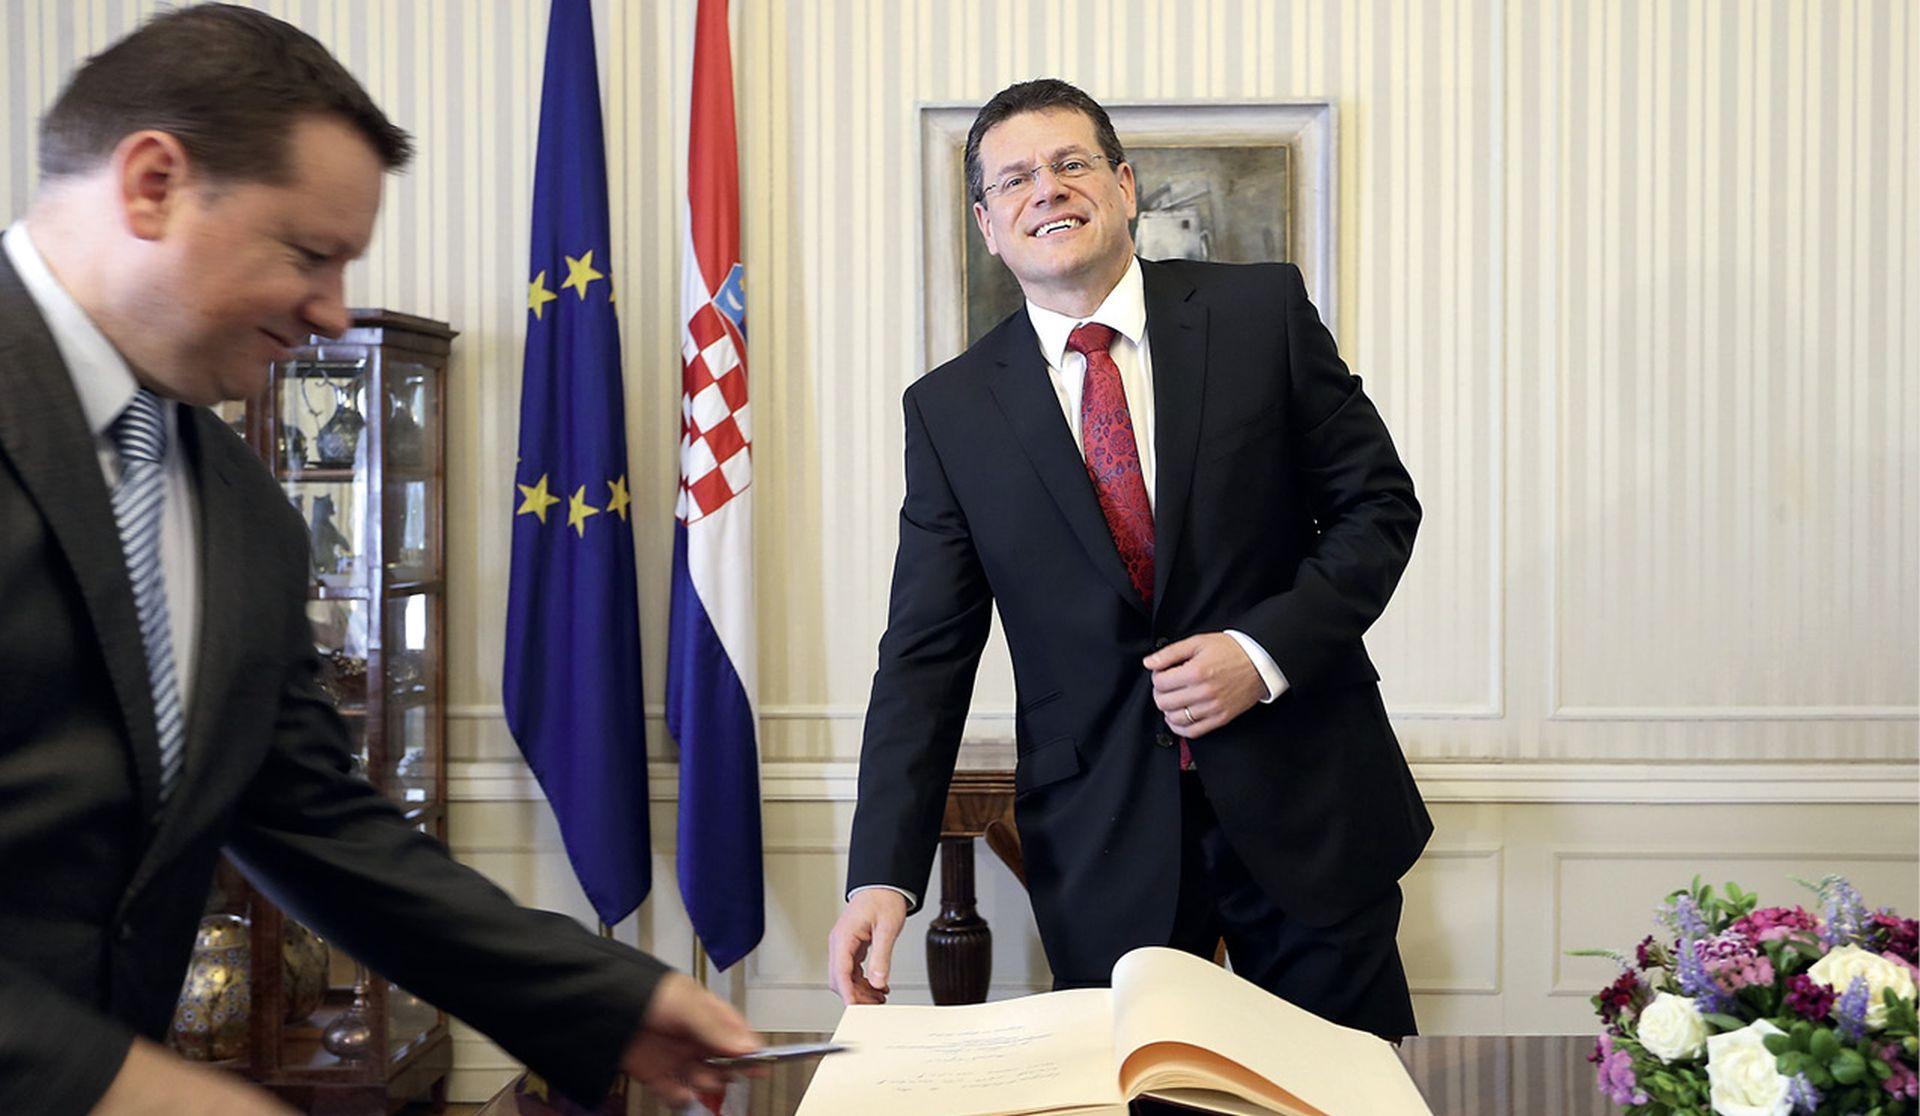 Kanadski konzorcij zbog LNG terminala tužio Hrvatsku Europskoj komisiji